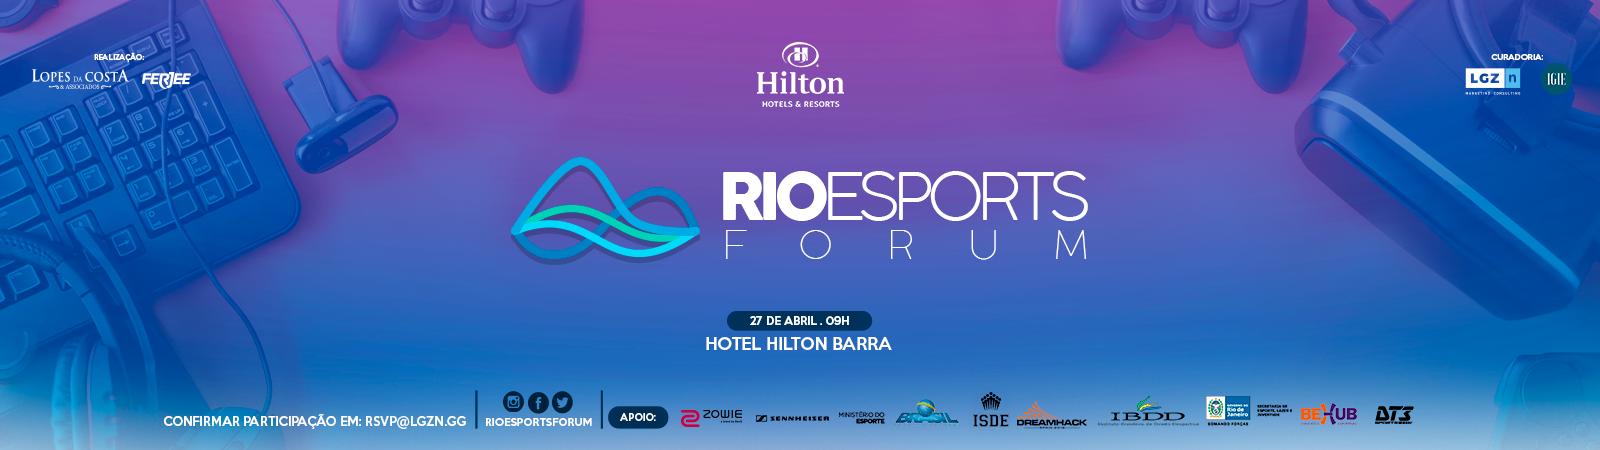 Rio Esports Forum